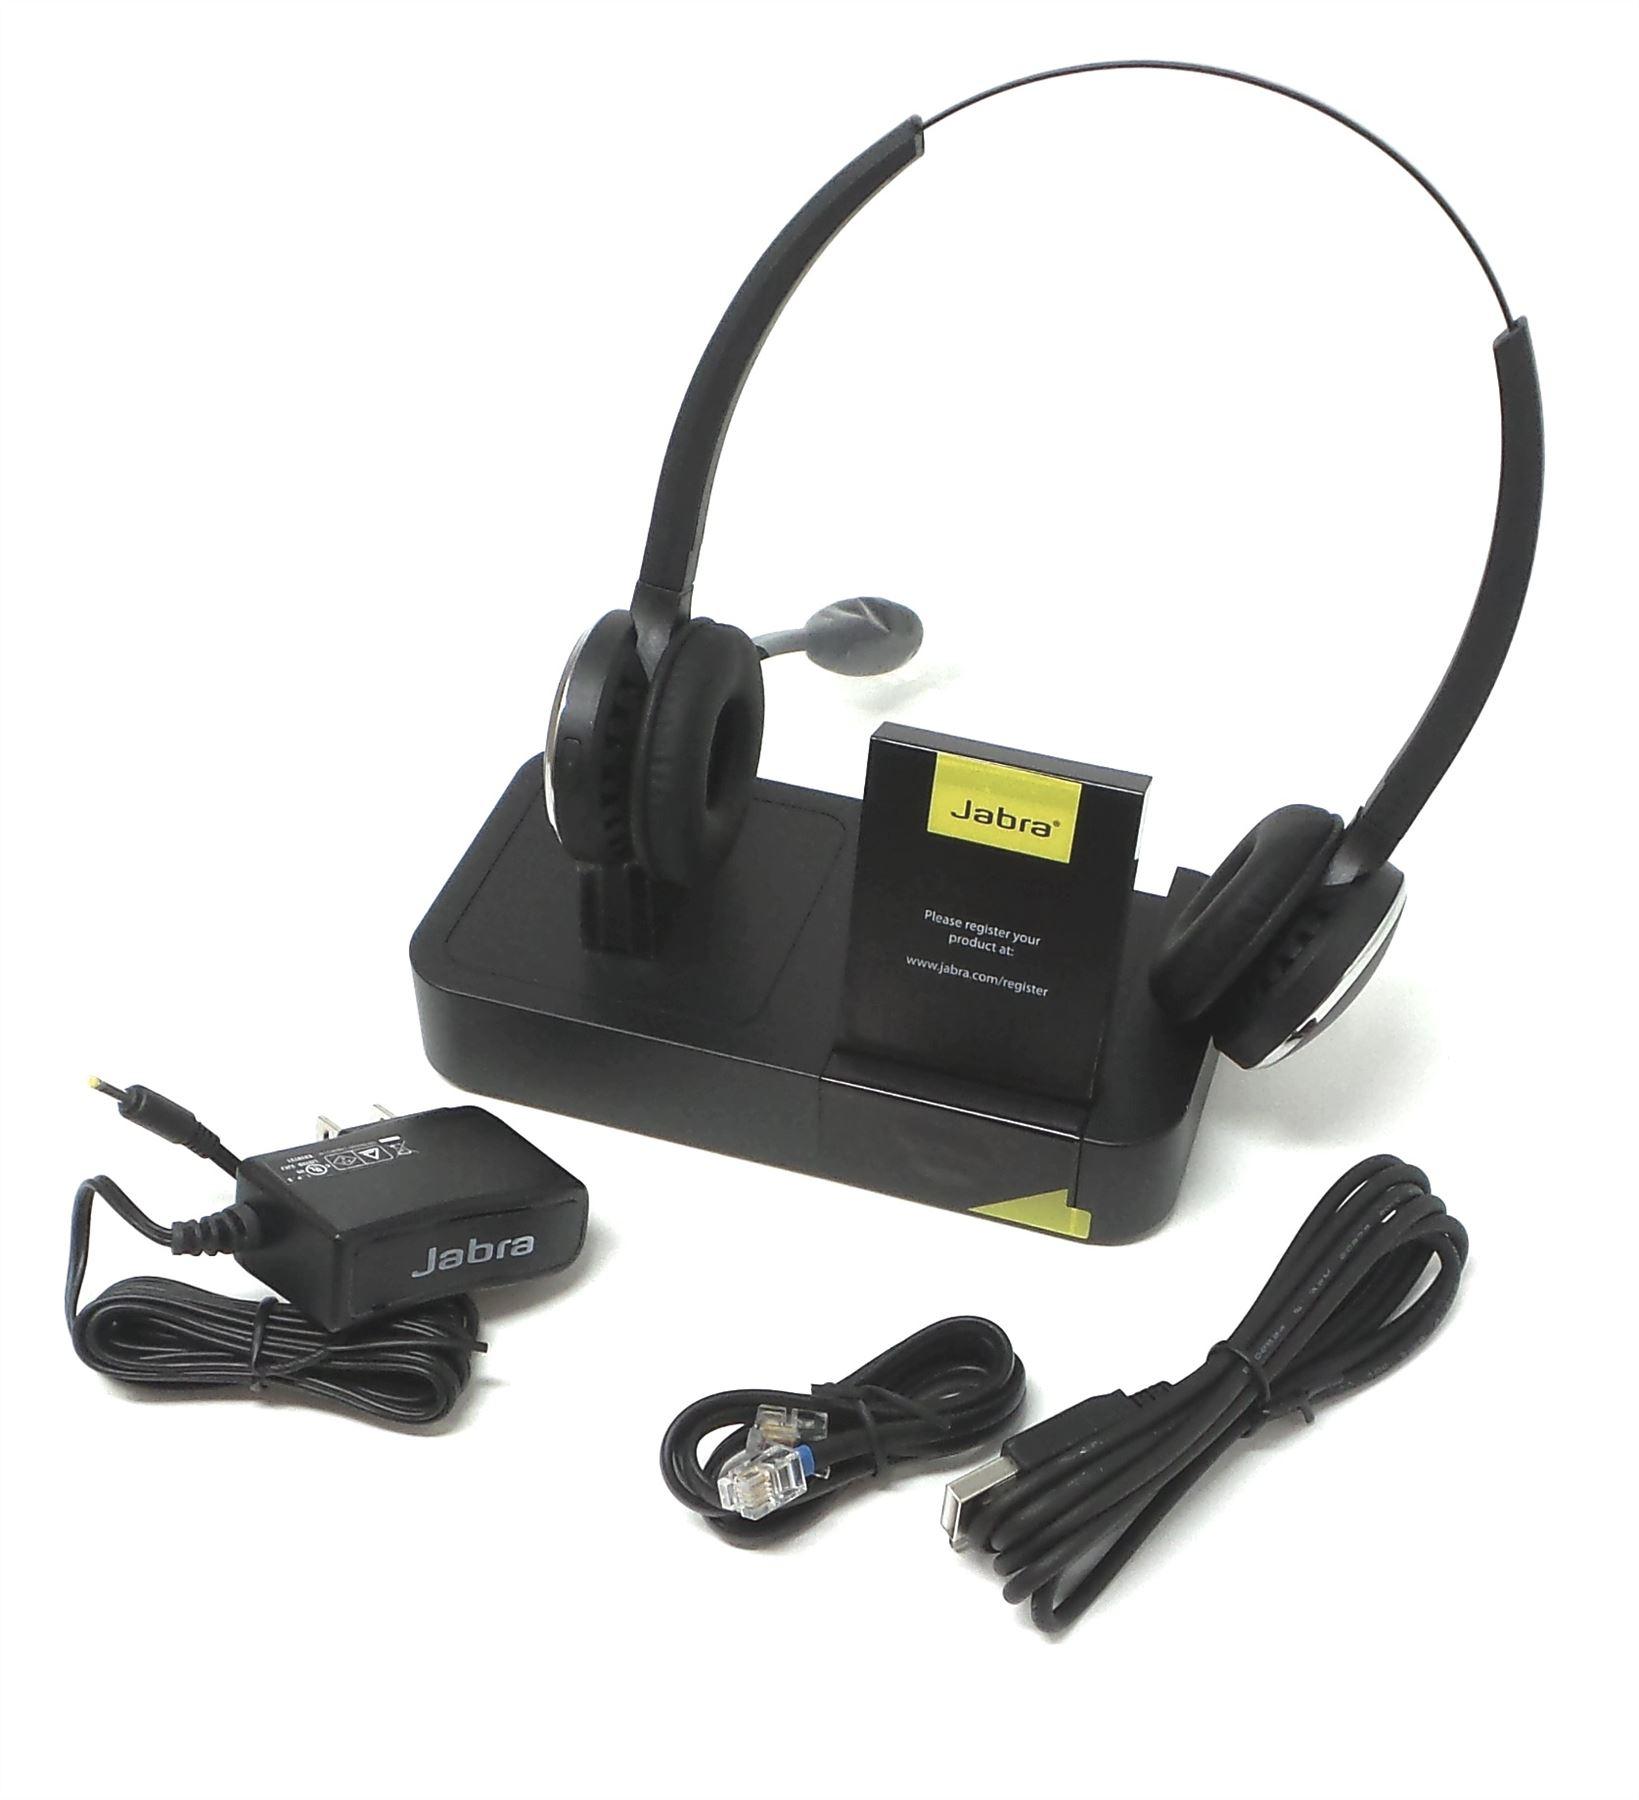 Jabra Pro 9460 Duo Wireless Headset For Deskphone Softphone Black  460 69 707 105